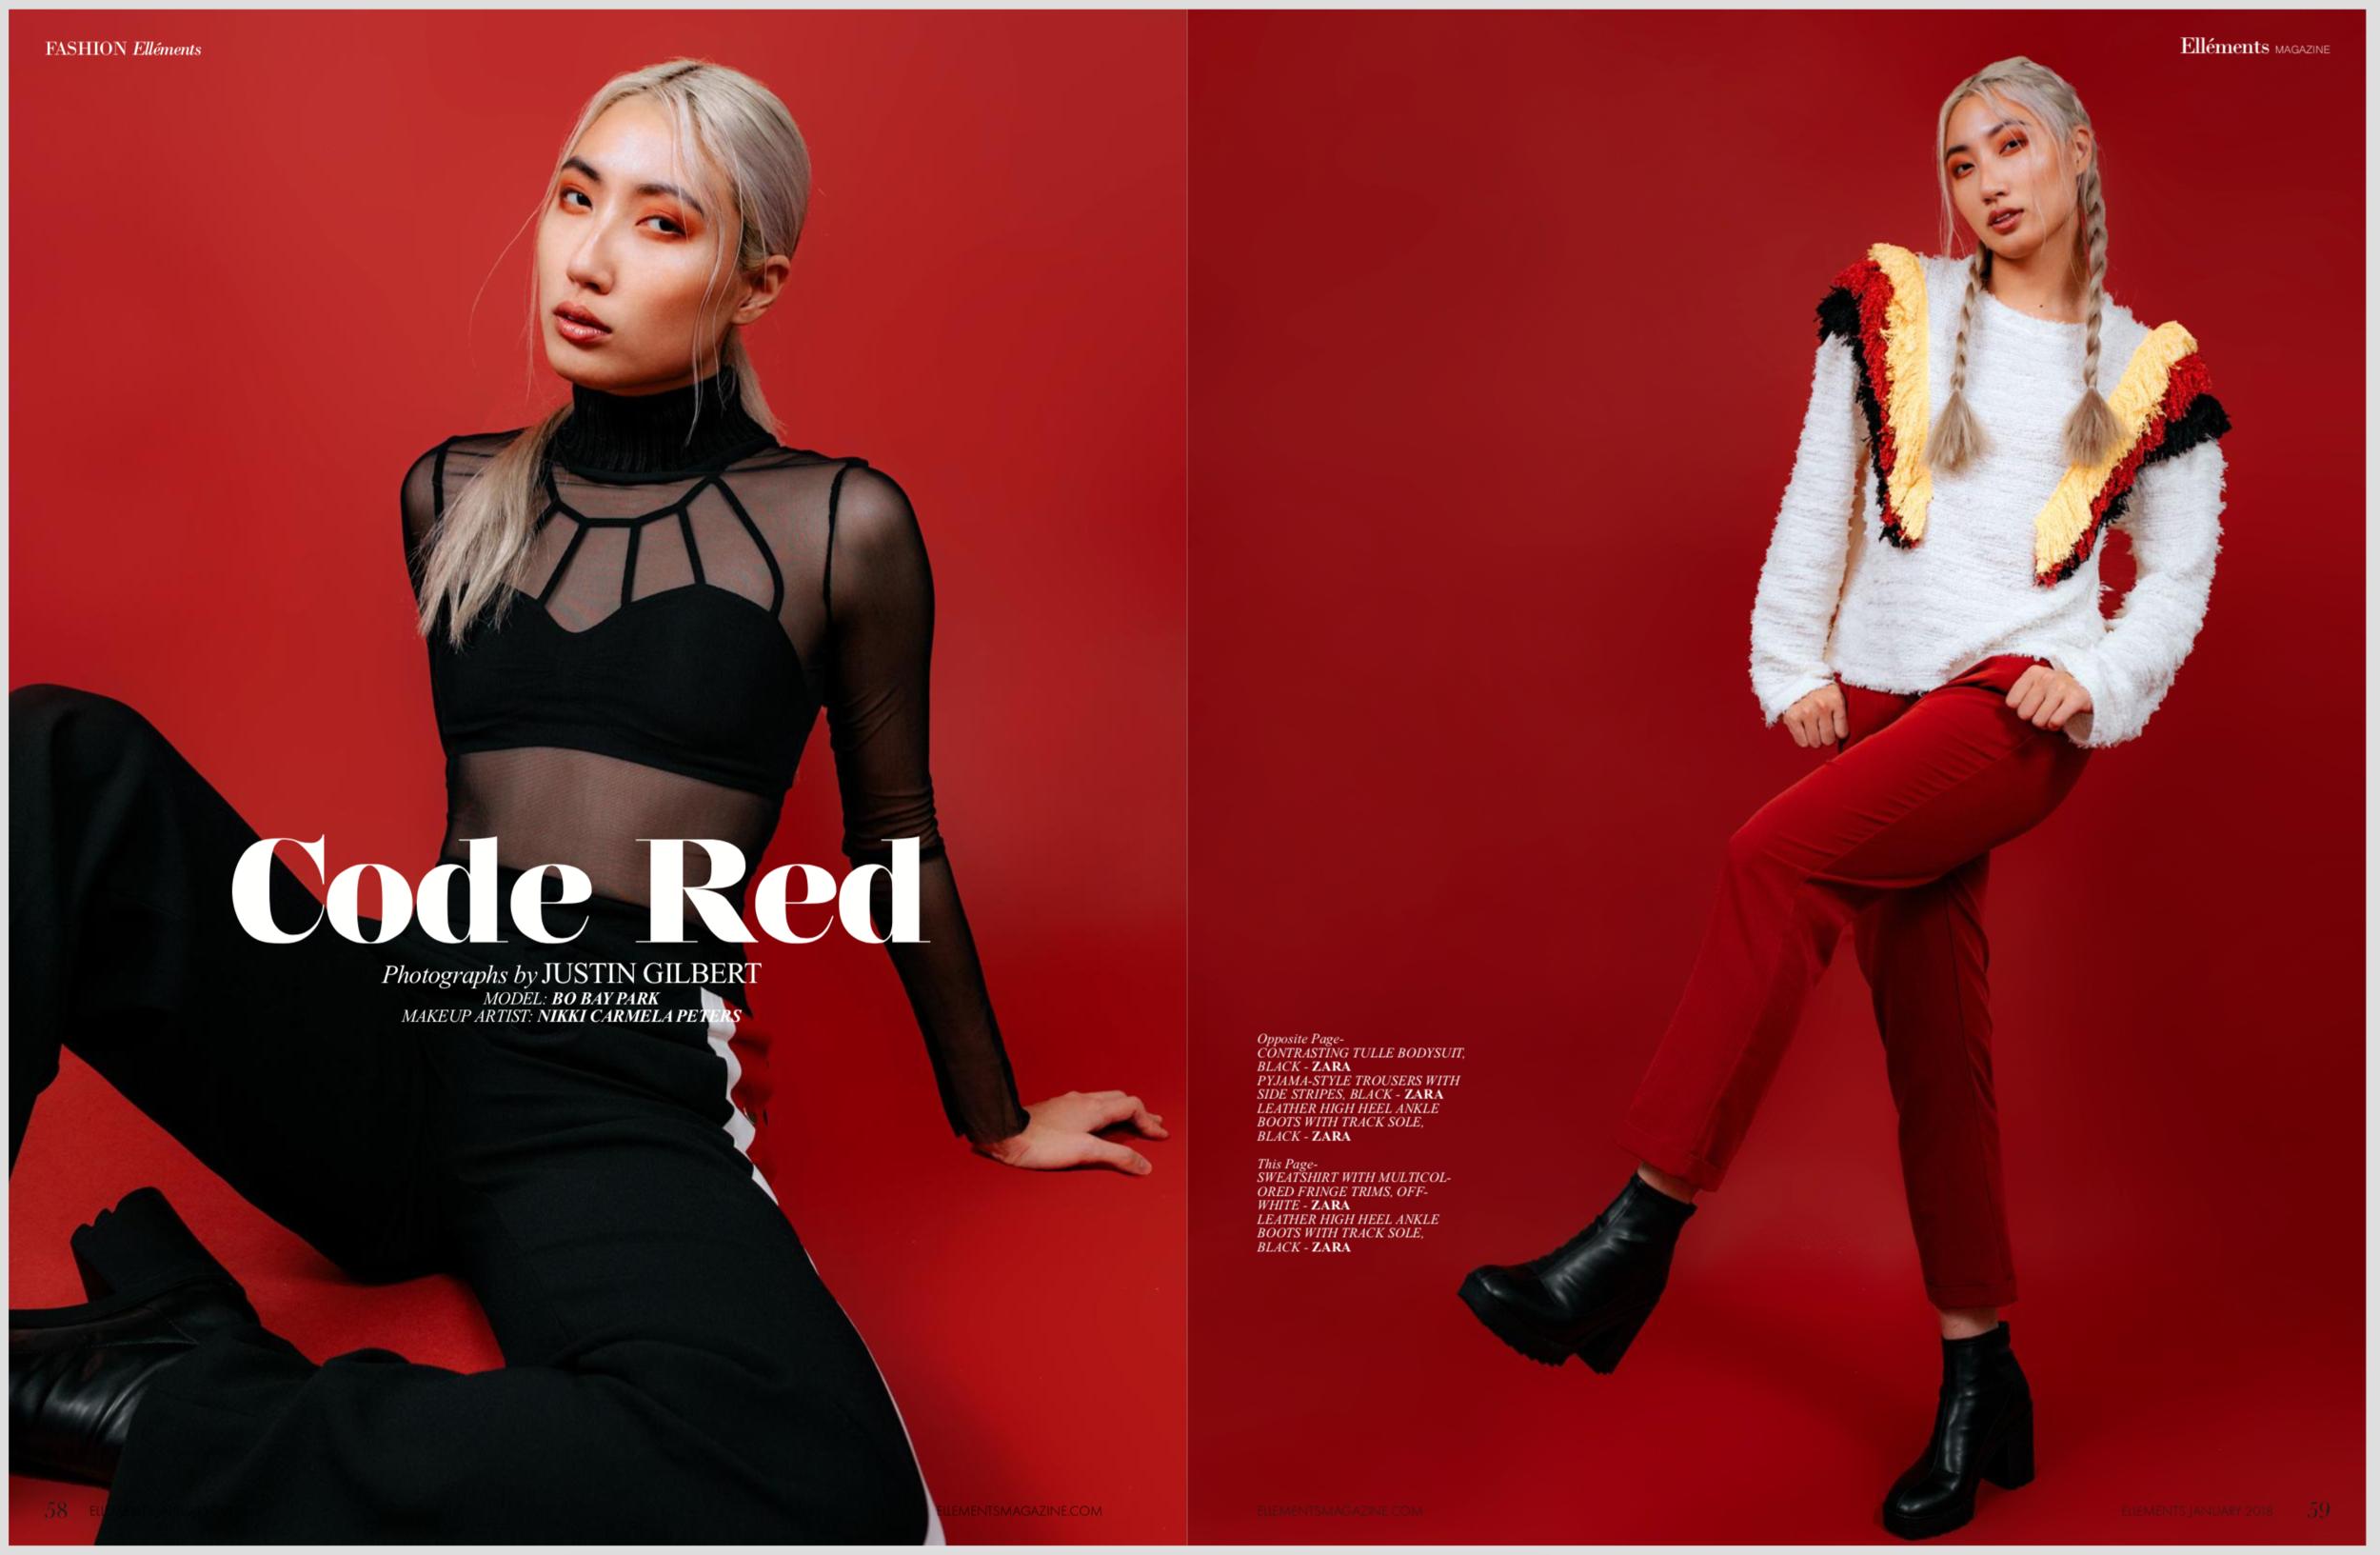 Justin Gilbert Ellements Magazine Editorial Fashion